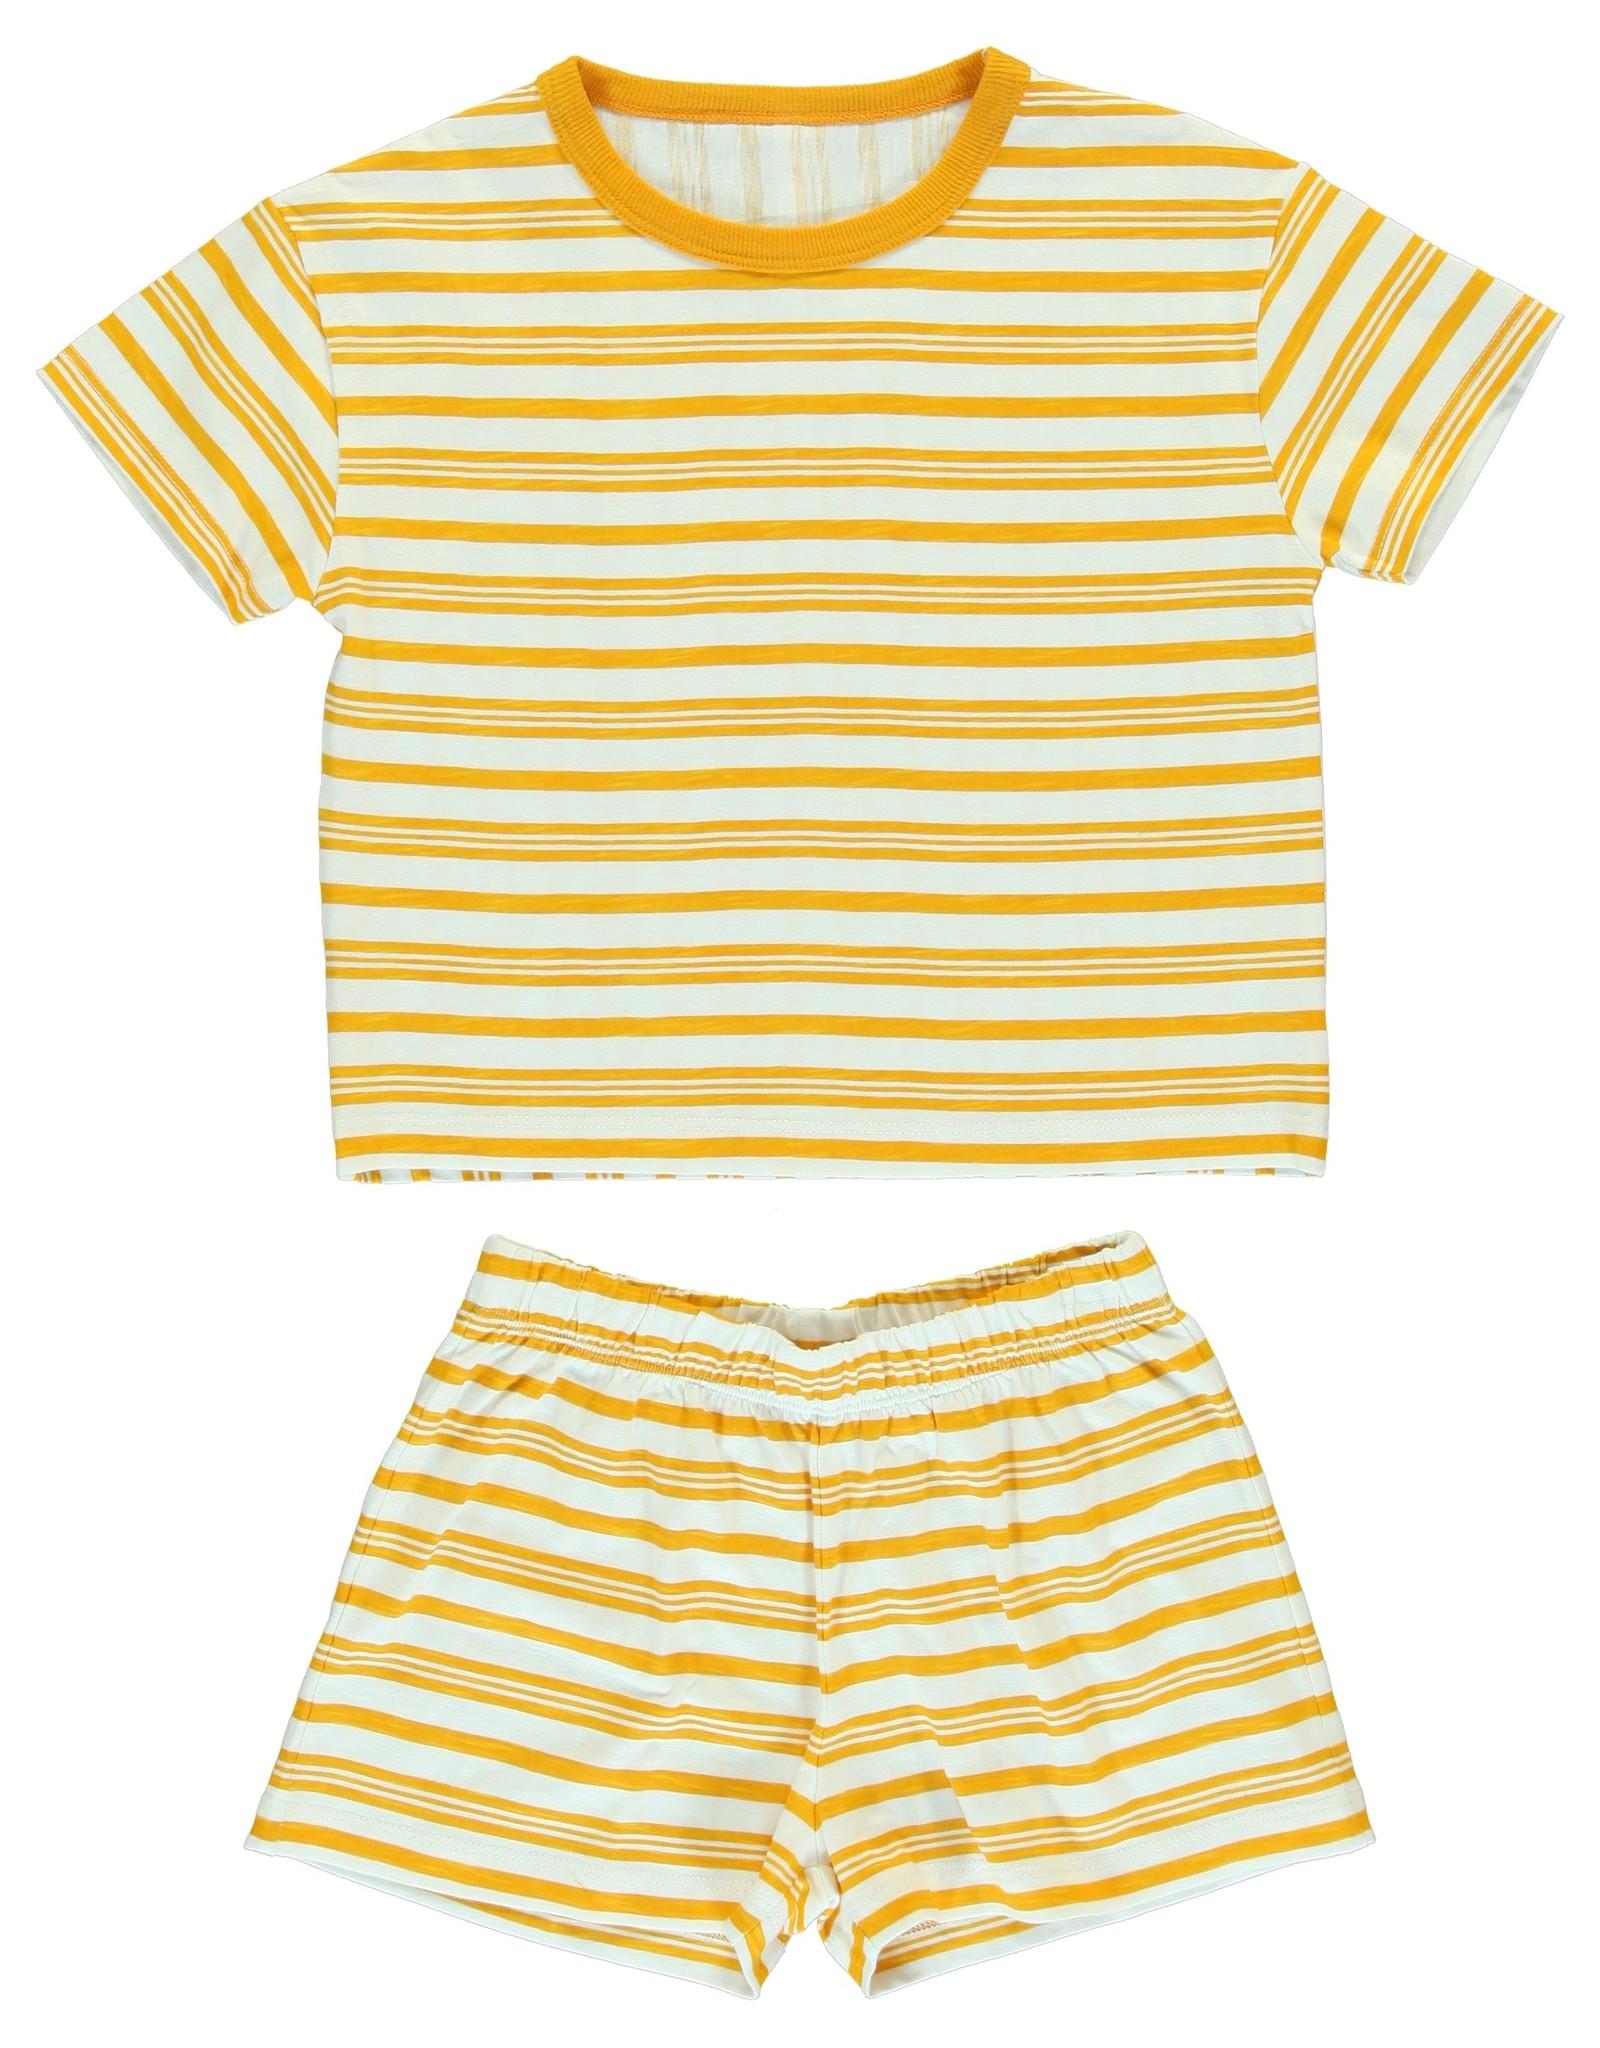 Dorélit Chaldene & Cressida | Pajama Set Jersey | Yellow